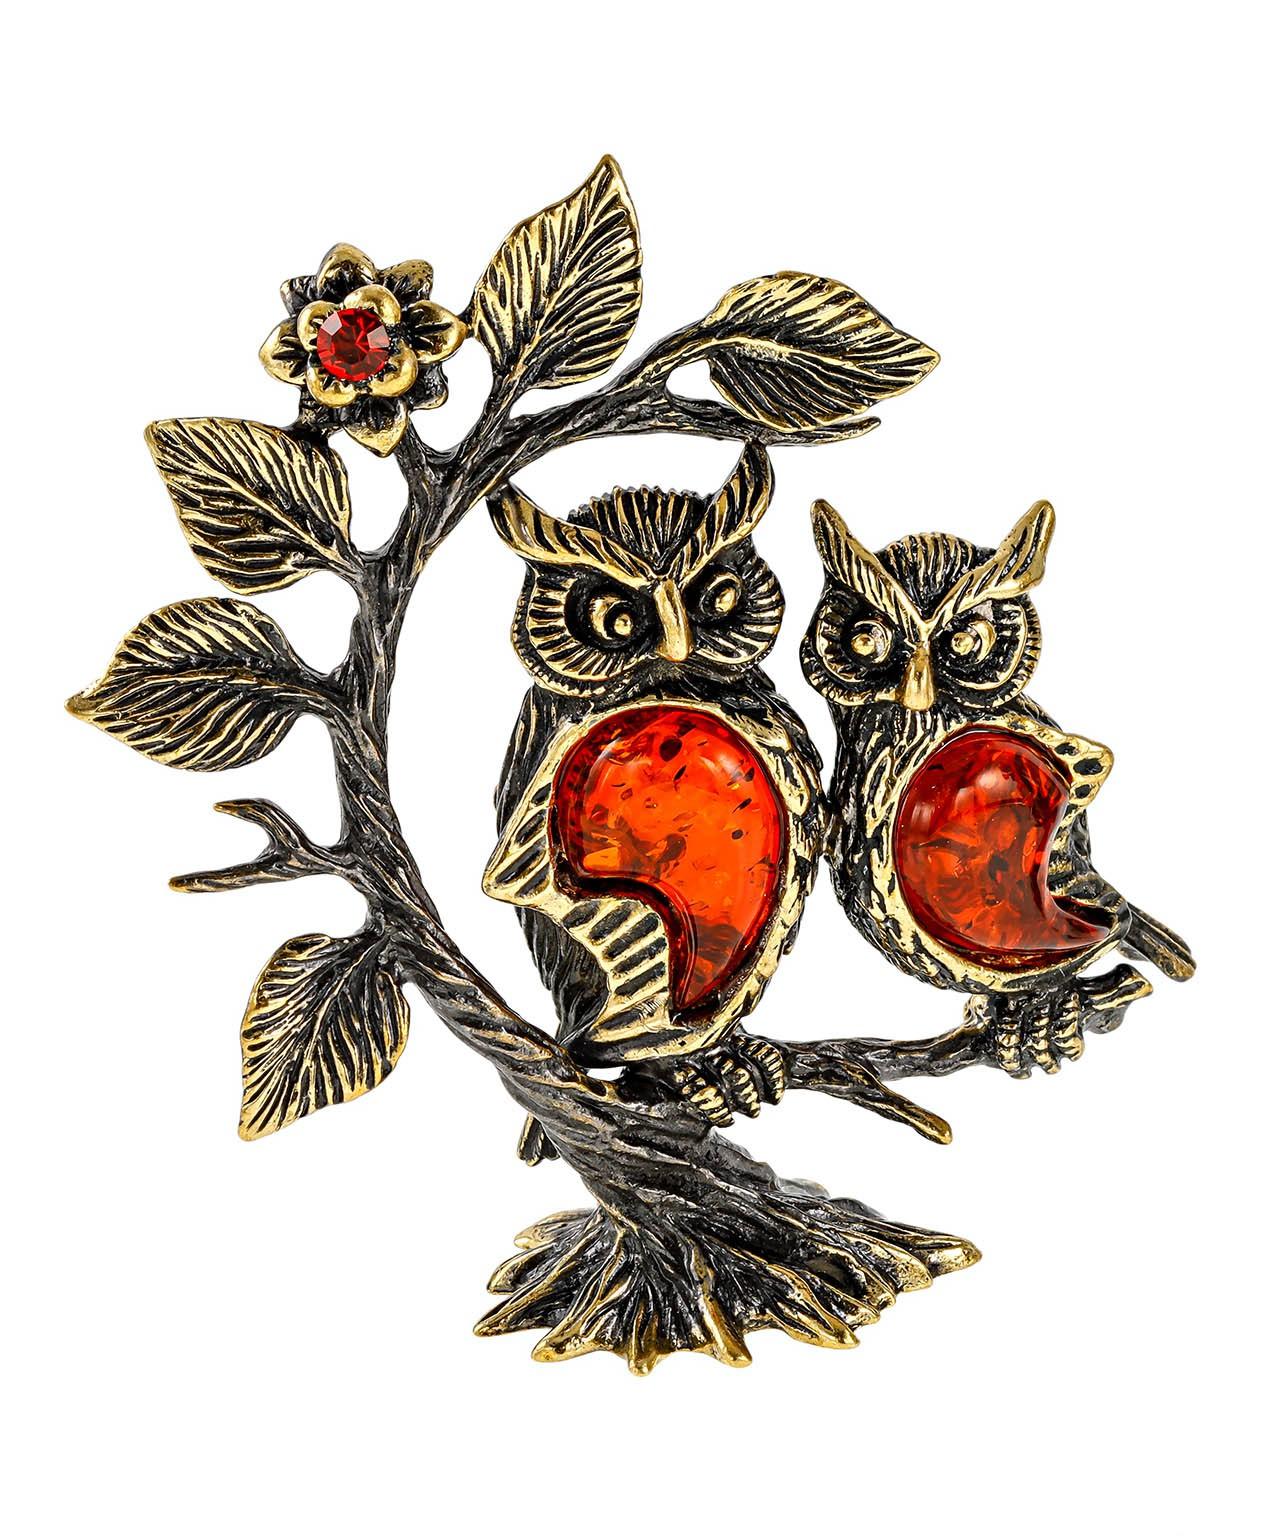 Птицы Совушки подружки на дереве без подставки 2385.1